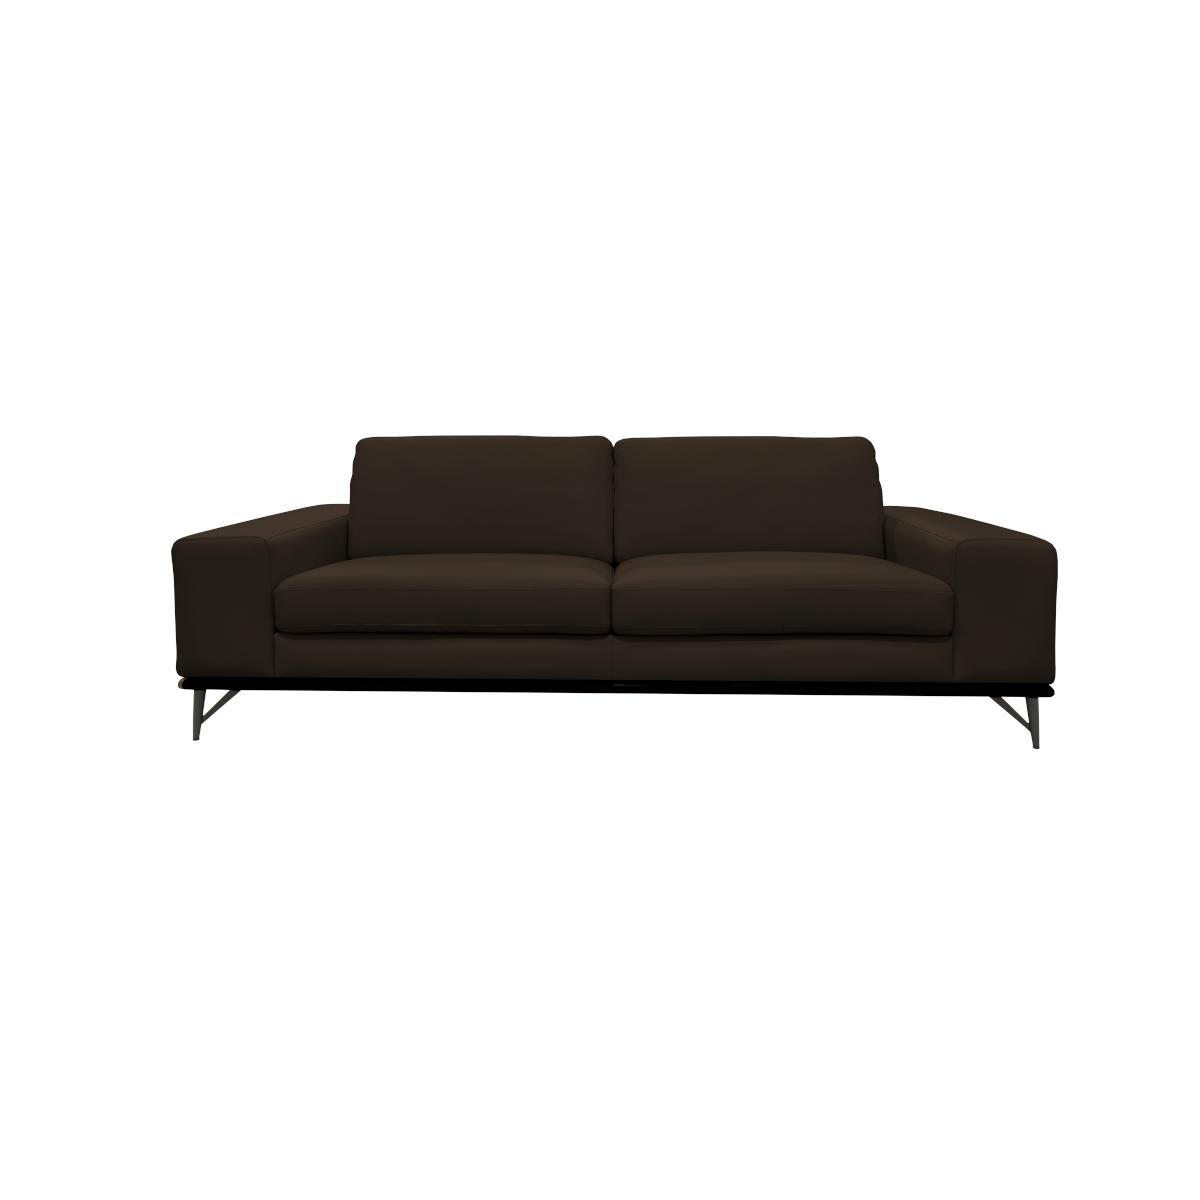 Yanko Full Leather 3-Seater